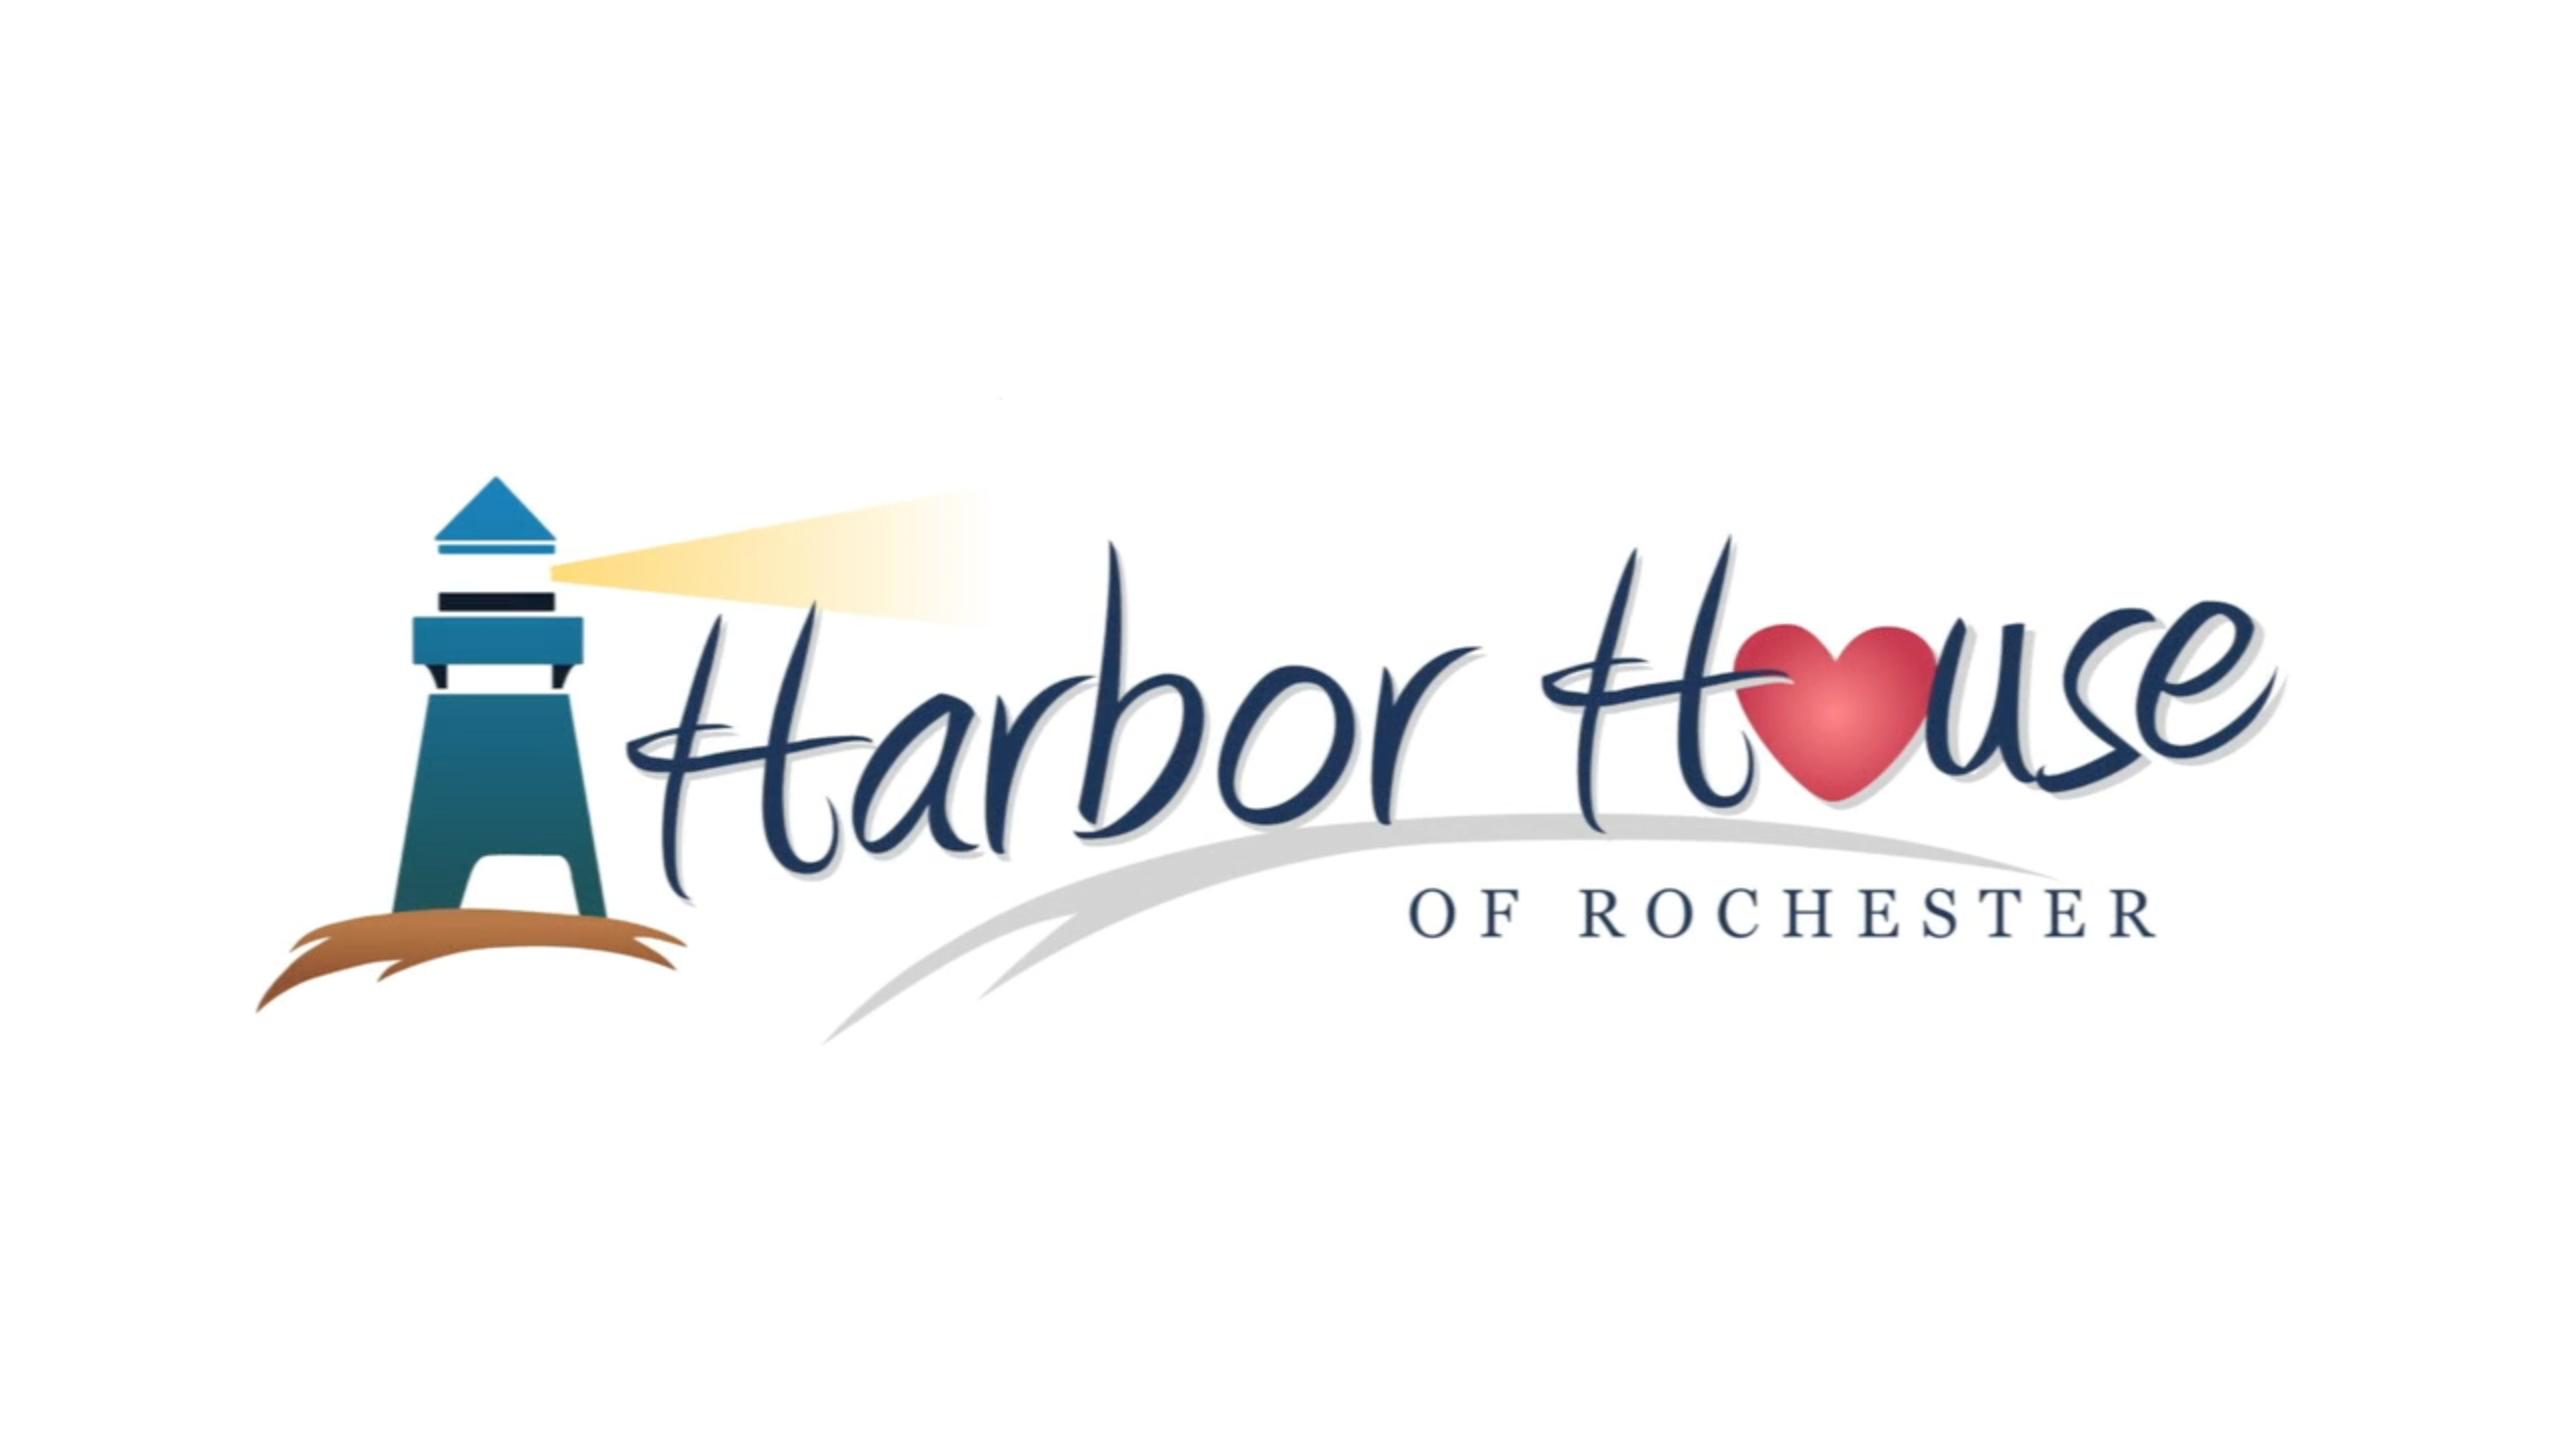 Harbor House of Rochester